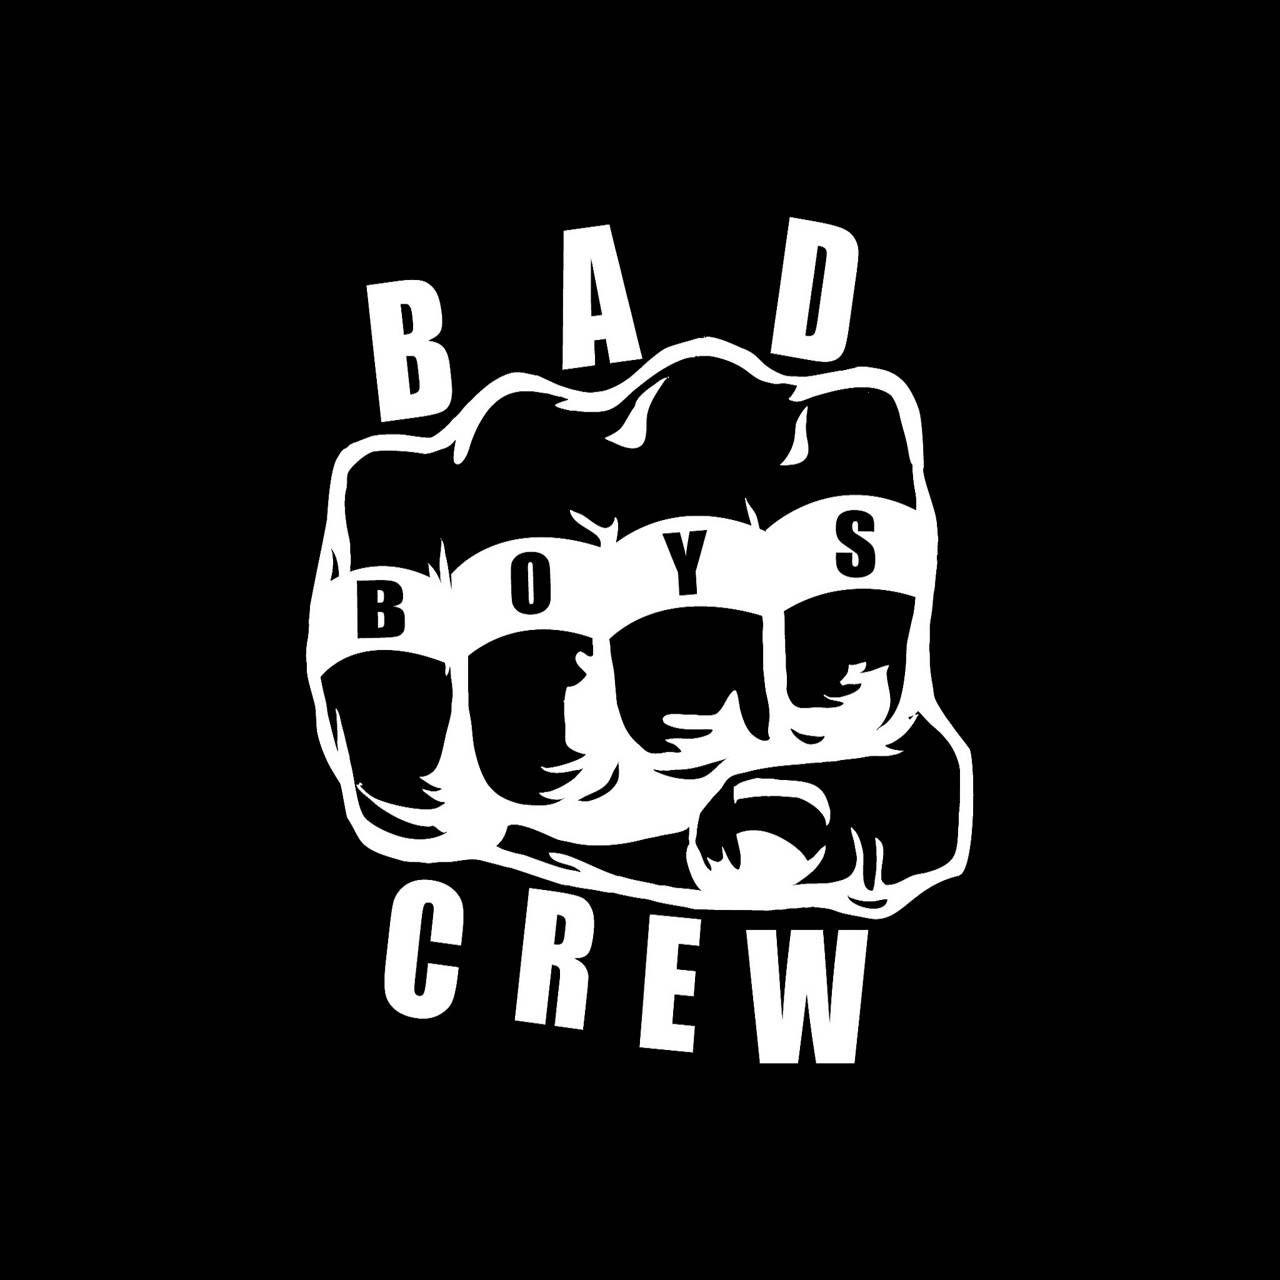 Bad Boy Wallpaper By Baddelta 1a Free On Zedge Boys Wallpaper Iphone Wallpaper Boys Art Logo